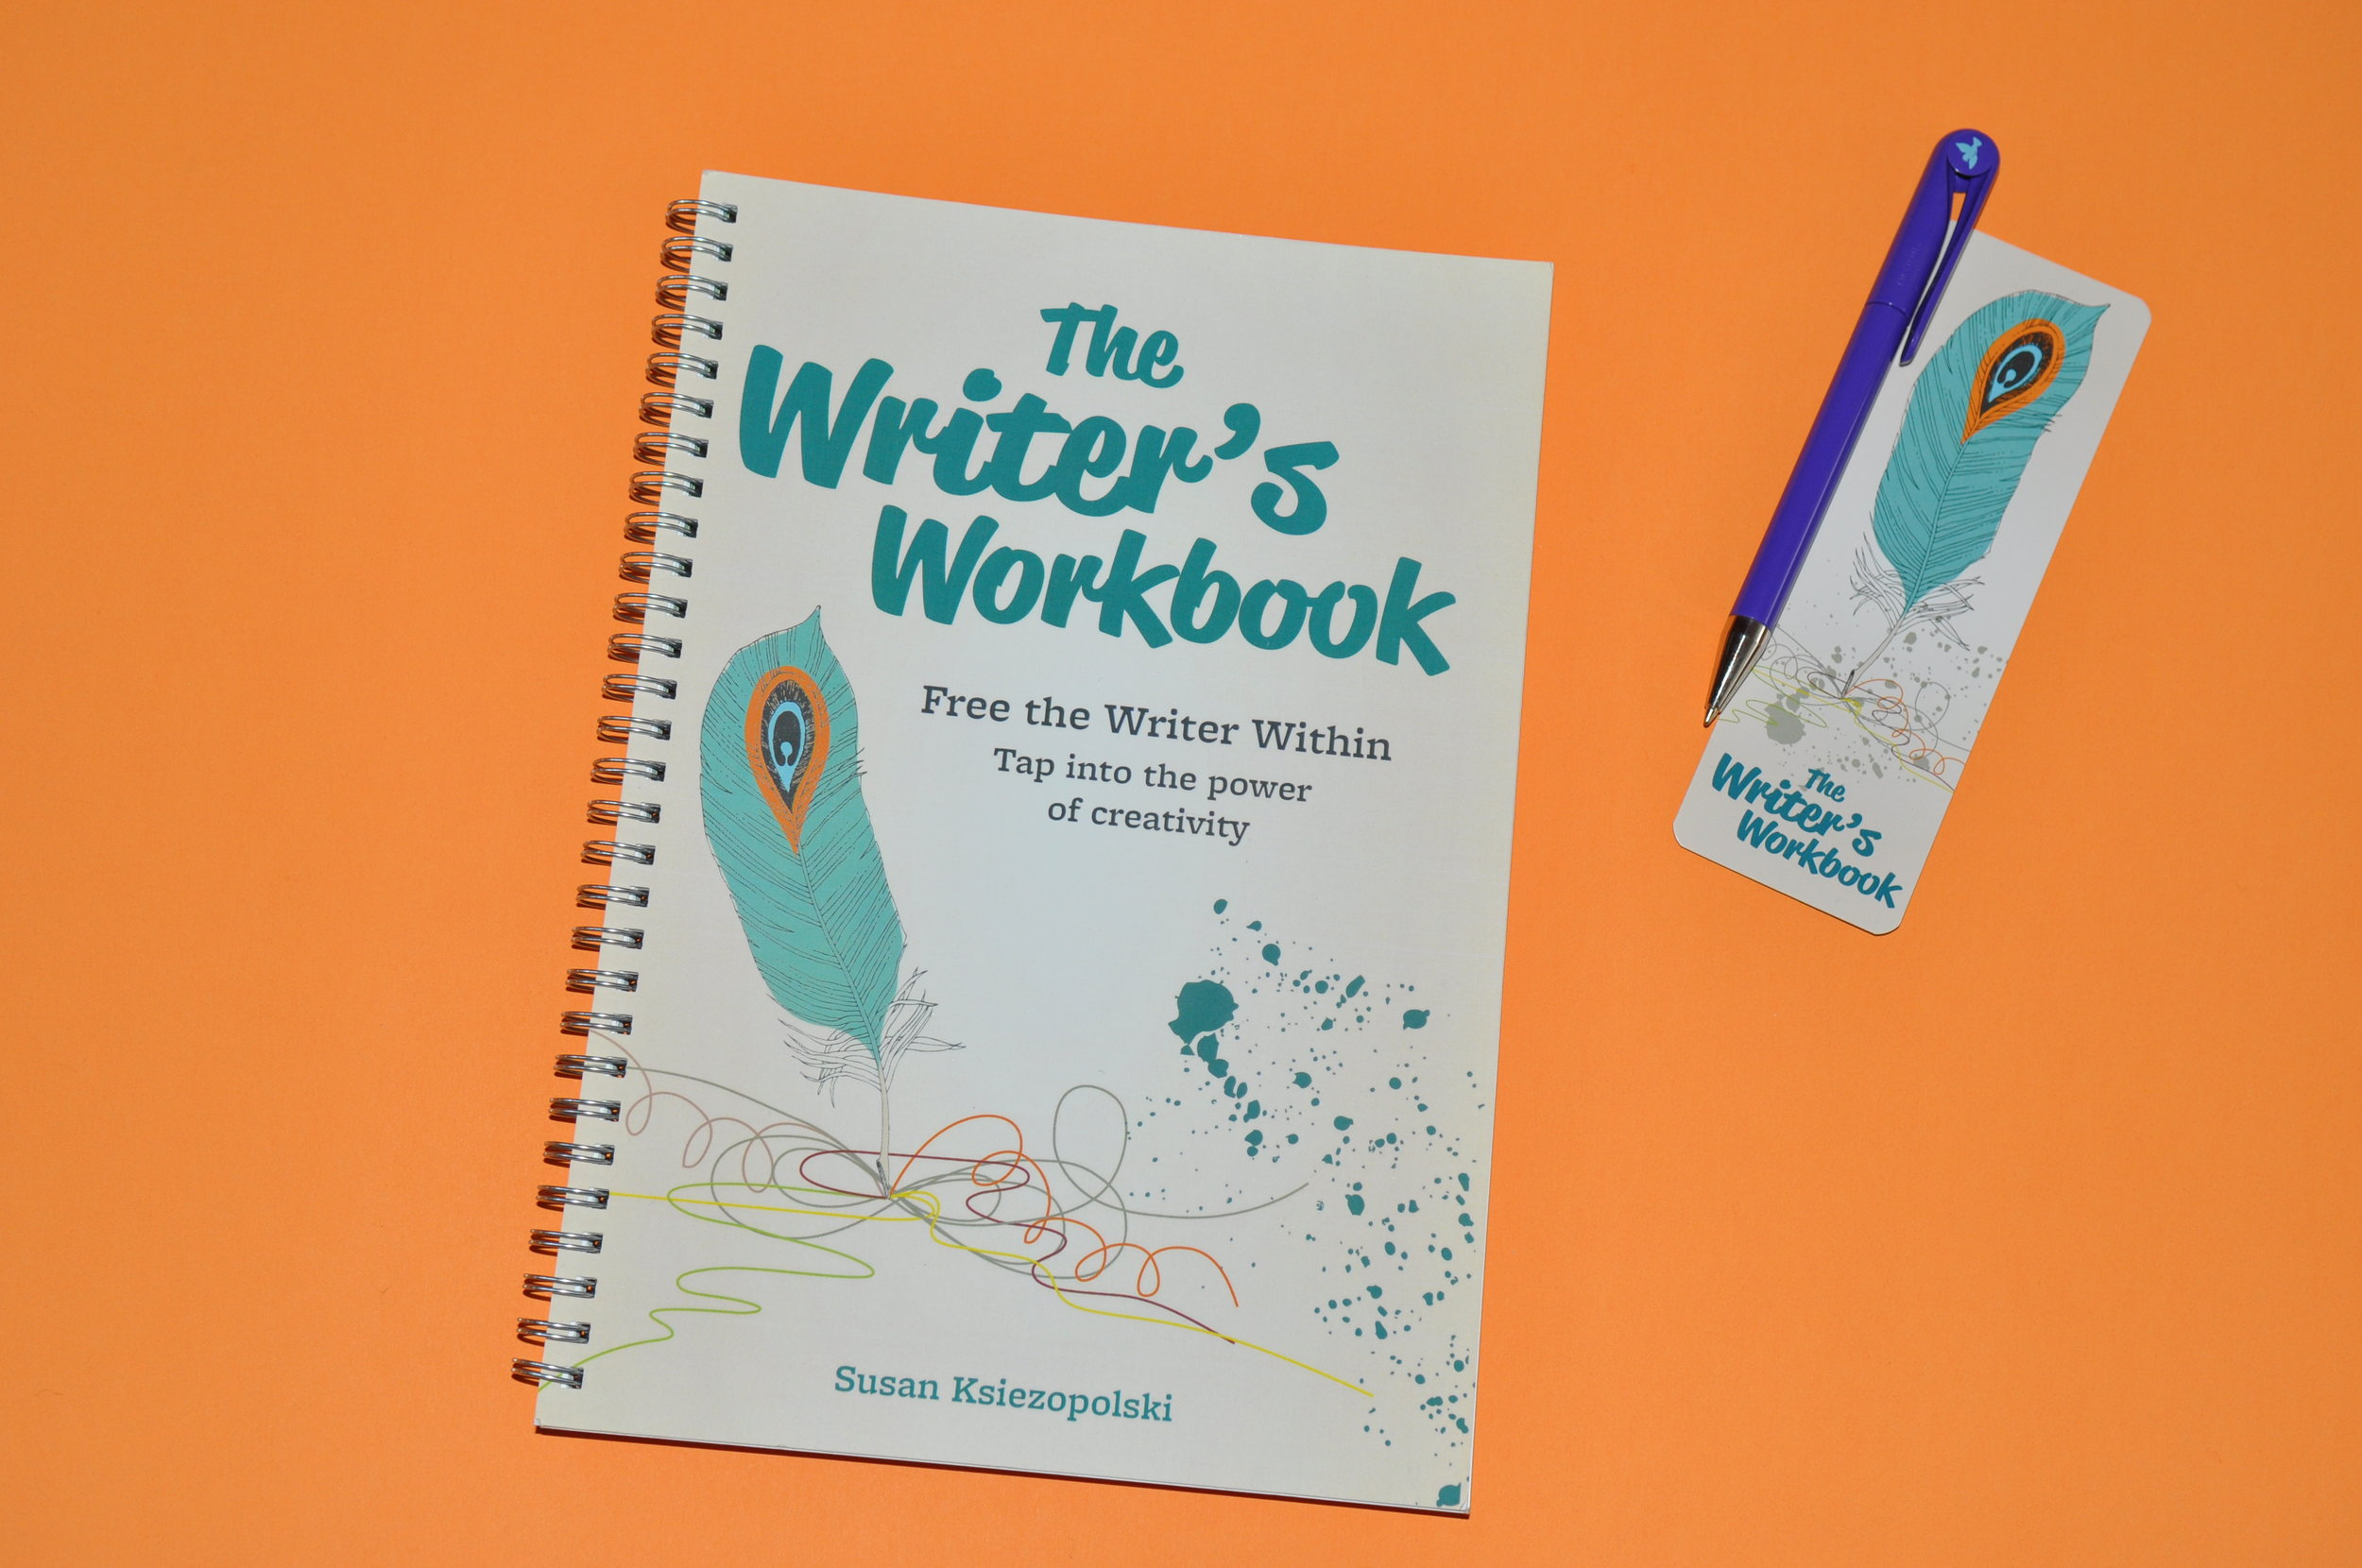 TheWriter'sWorkbook_Cover.JPG